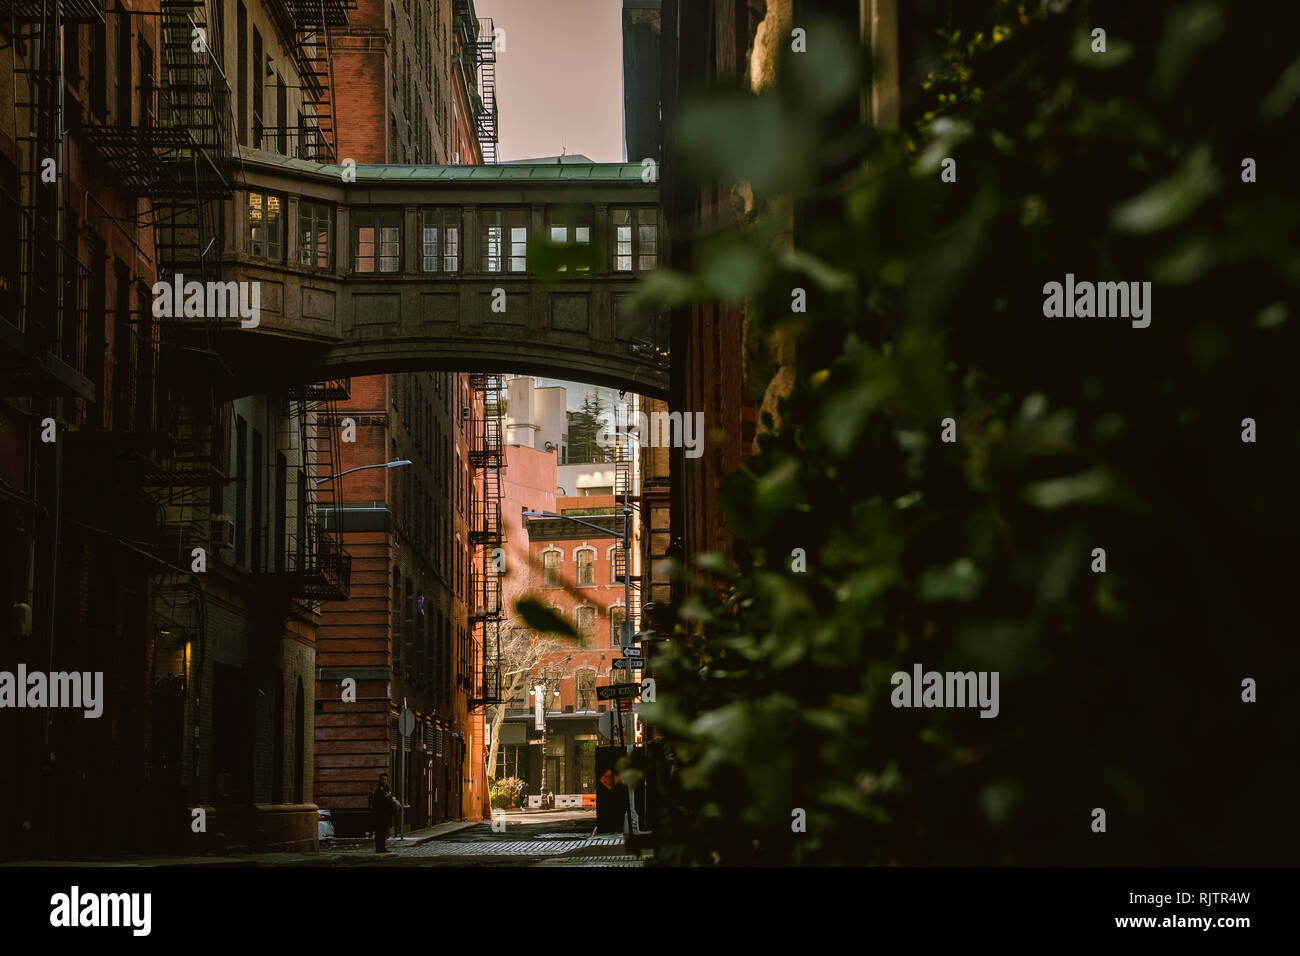 Staple Street Skybridge - Stock Image